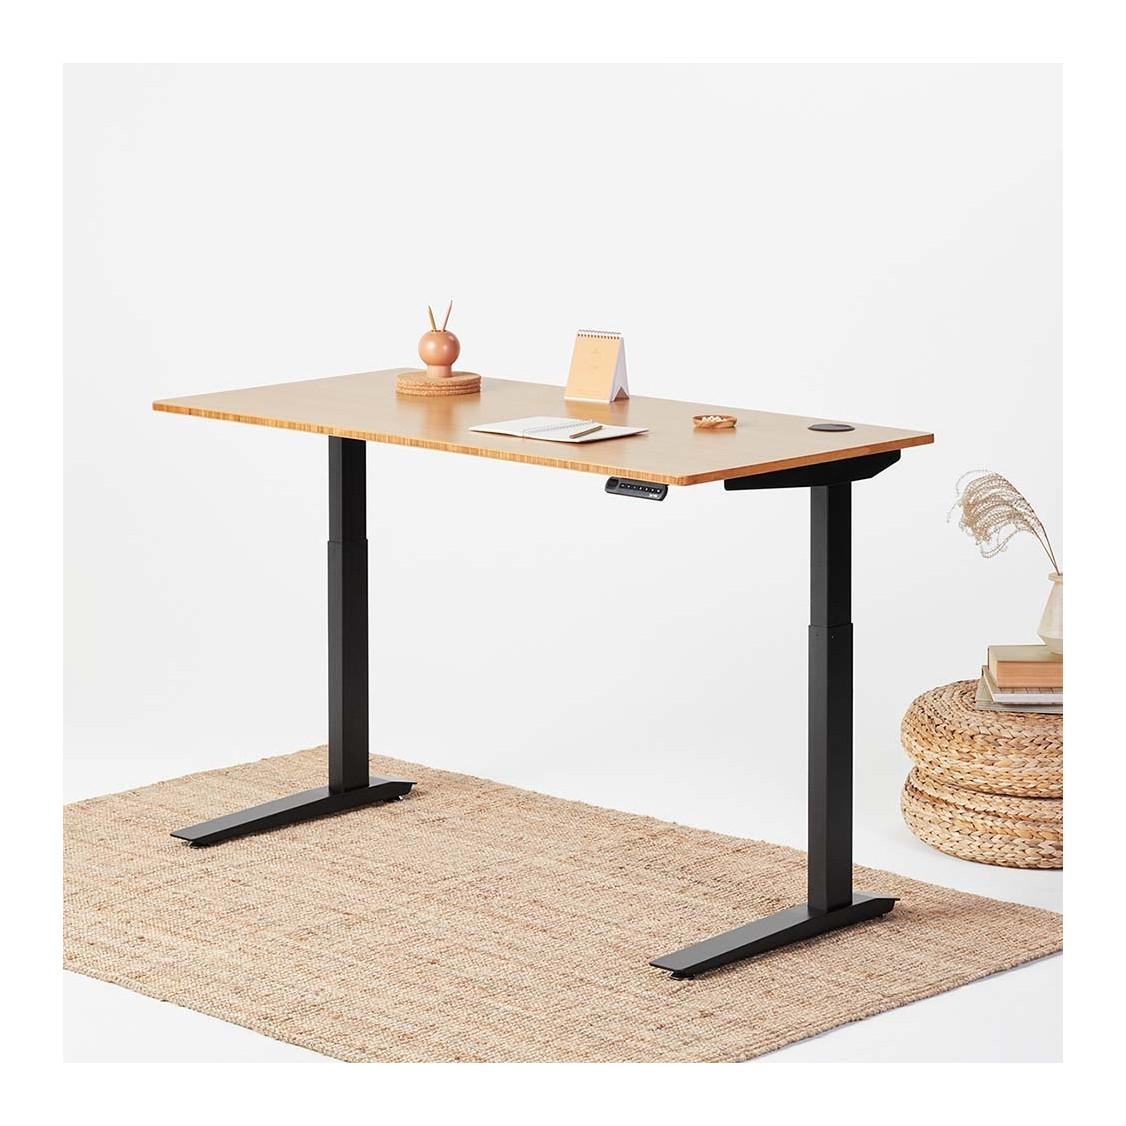 standing desk review and comparison fully varidesk vs autonomous. Black Bedroom Furniture Sets. Home Design Ideas